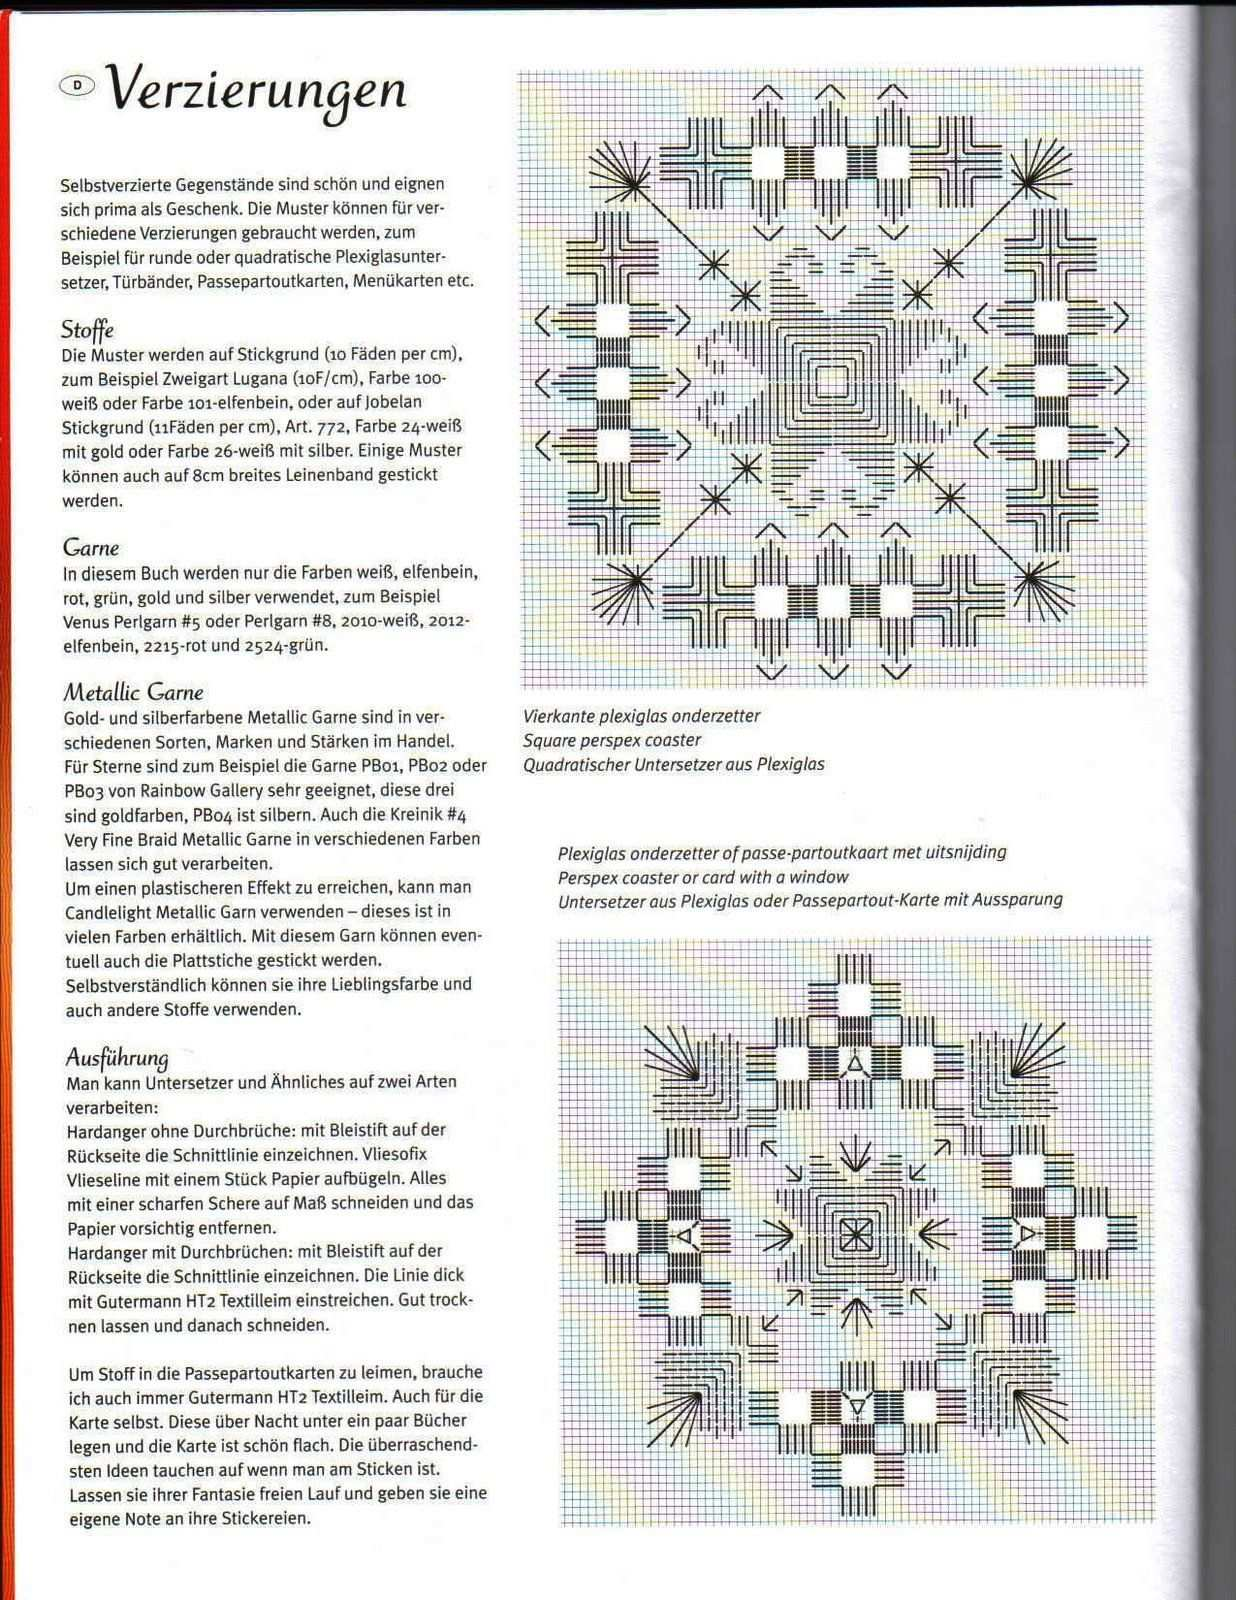 10 Vivacious Hardanger Embroidery Ideas In 2020 Hardanger Embroidery Learn Embroidery Embroidery Tutorials